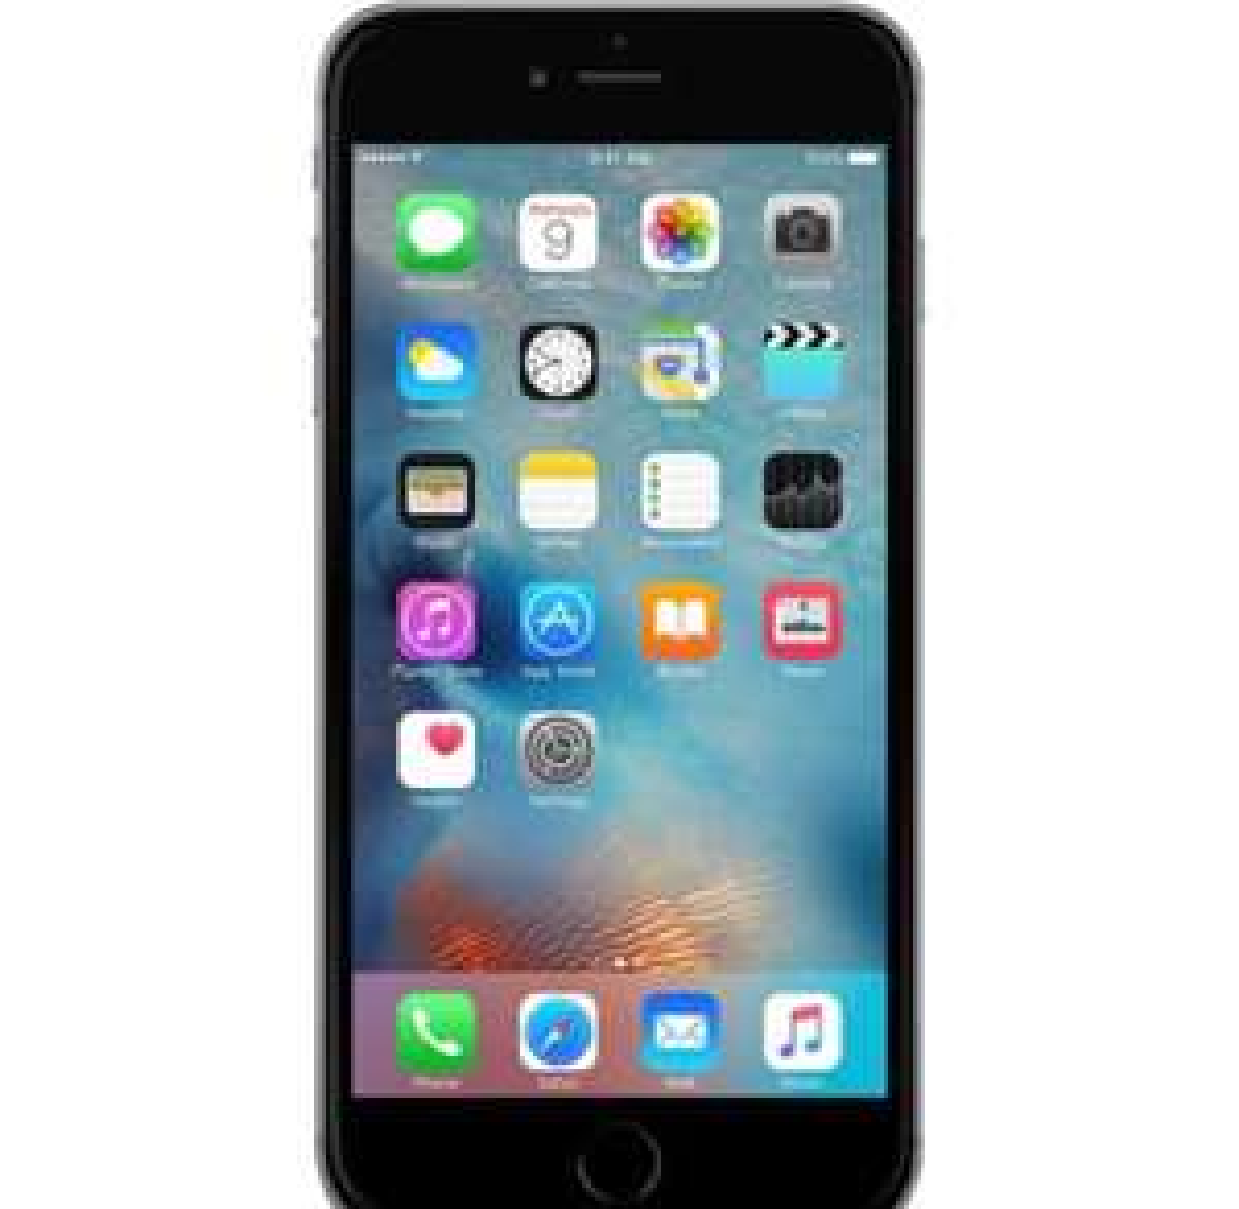 [Lokal Aldi Bad Münstereifel] IPhone 6 Plus 16 GB für 339,- €. PVG 399,- €